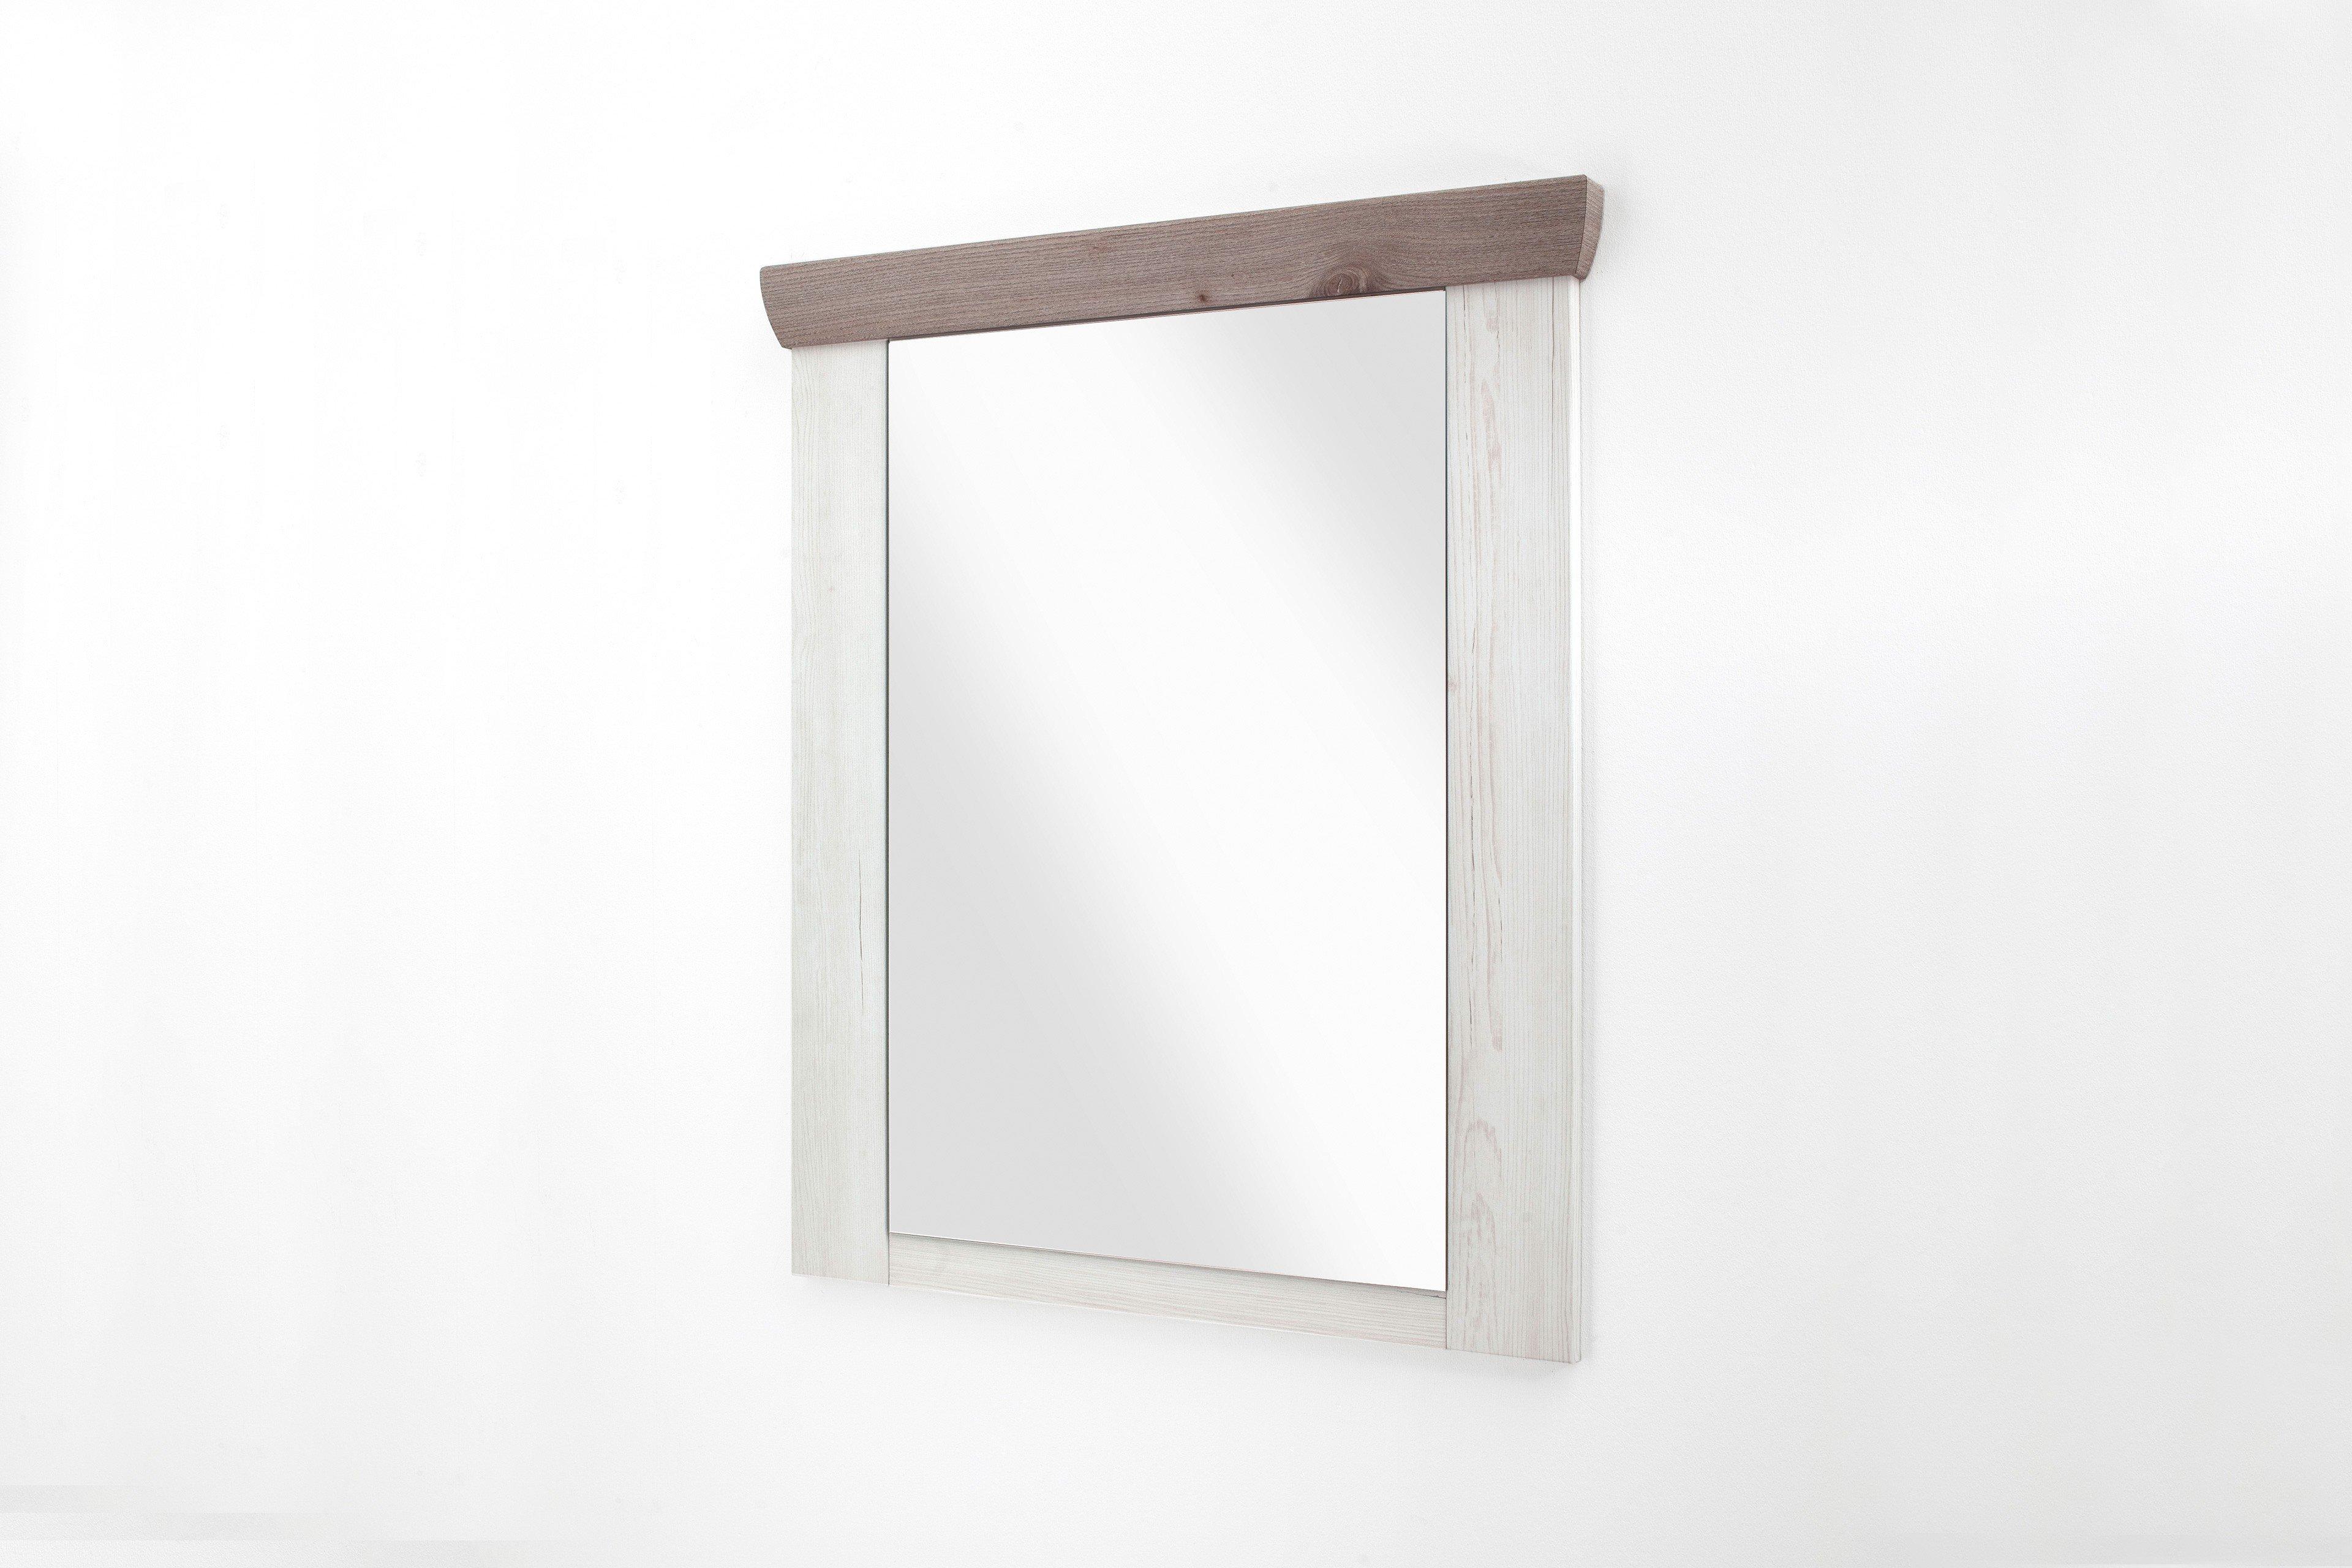 1fedea2558f3ef Garderobenspiegel Bozen Pinie Aurelio - MCA furniture